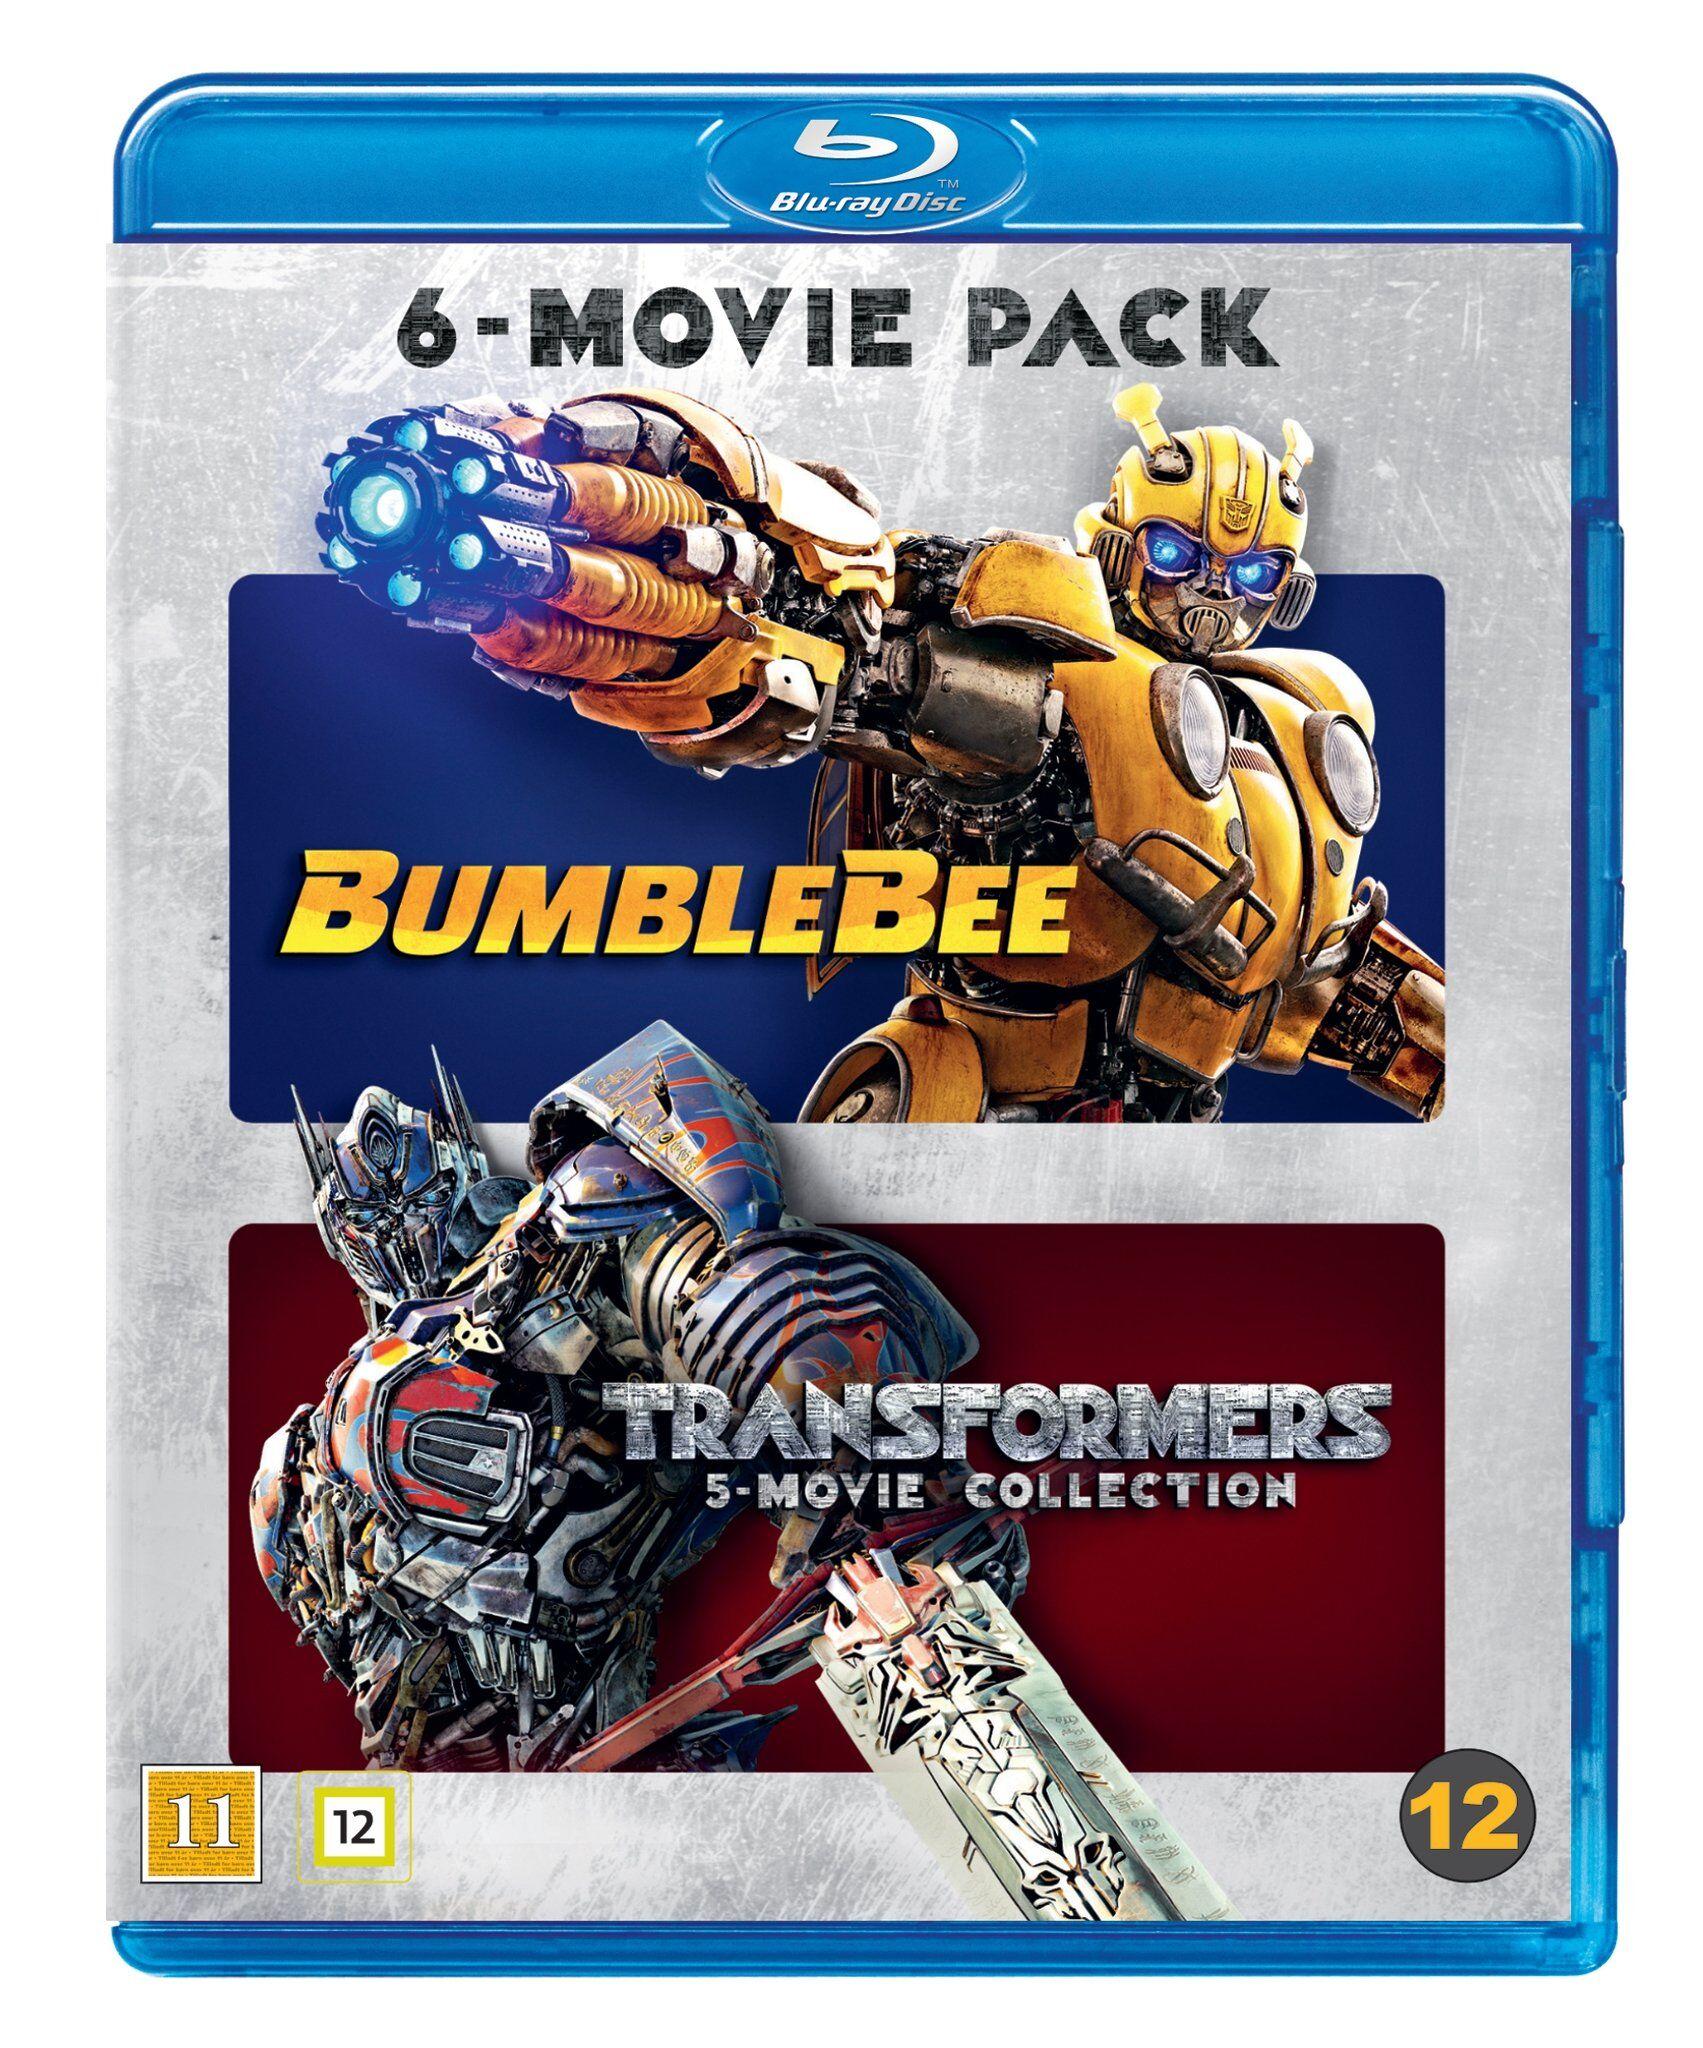 Transformers 1-6 (incl Bumblebee) Blu ray